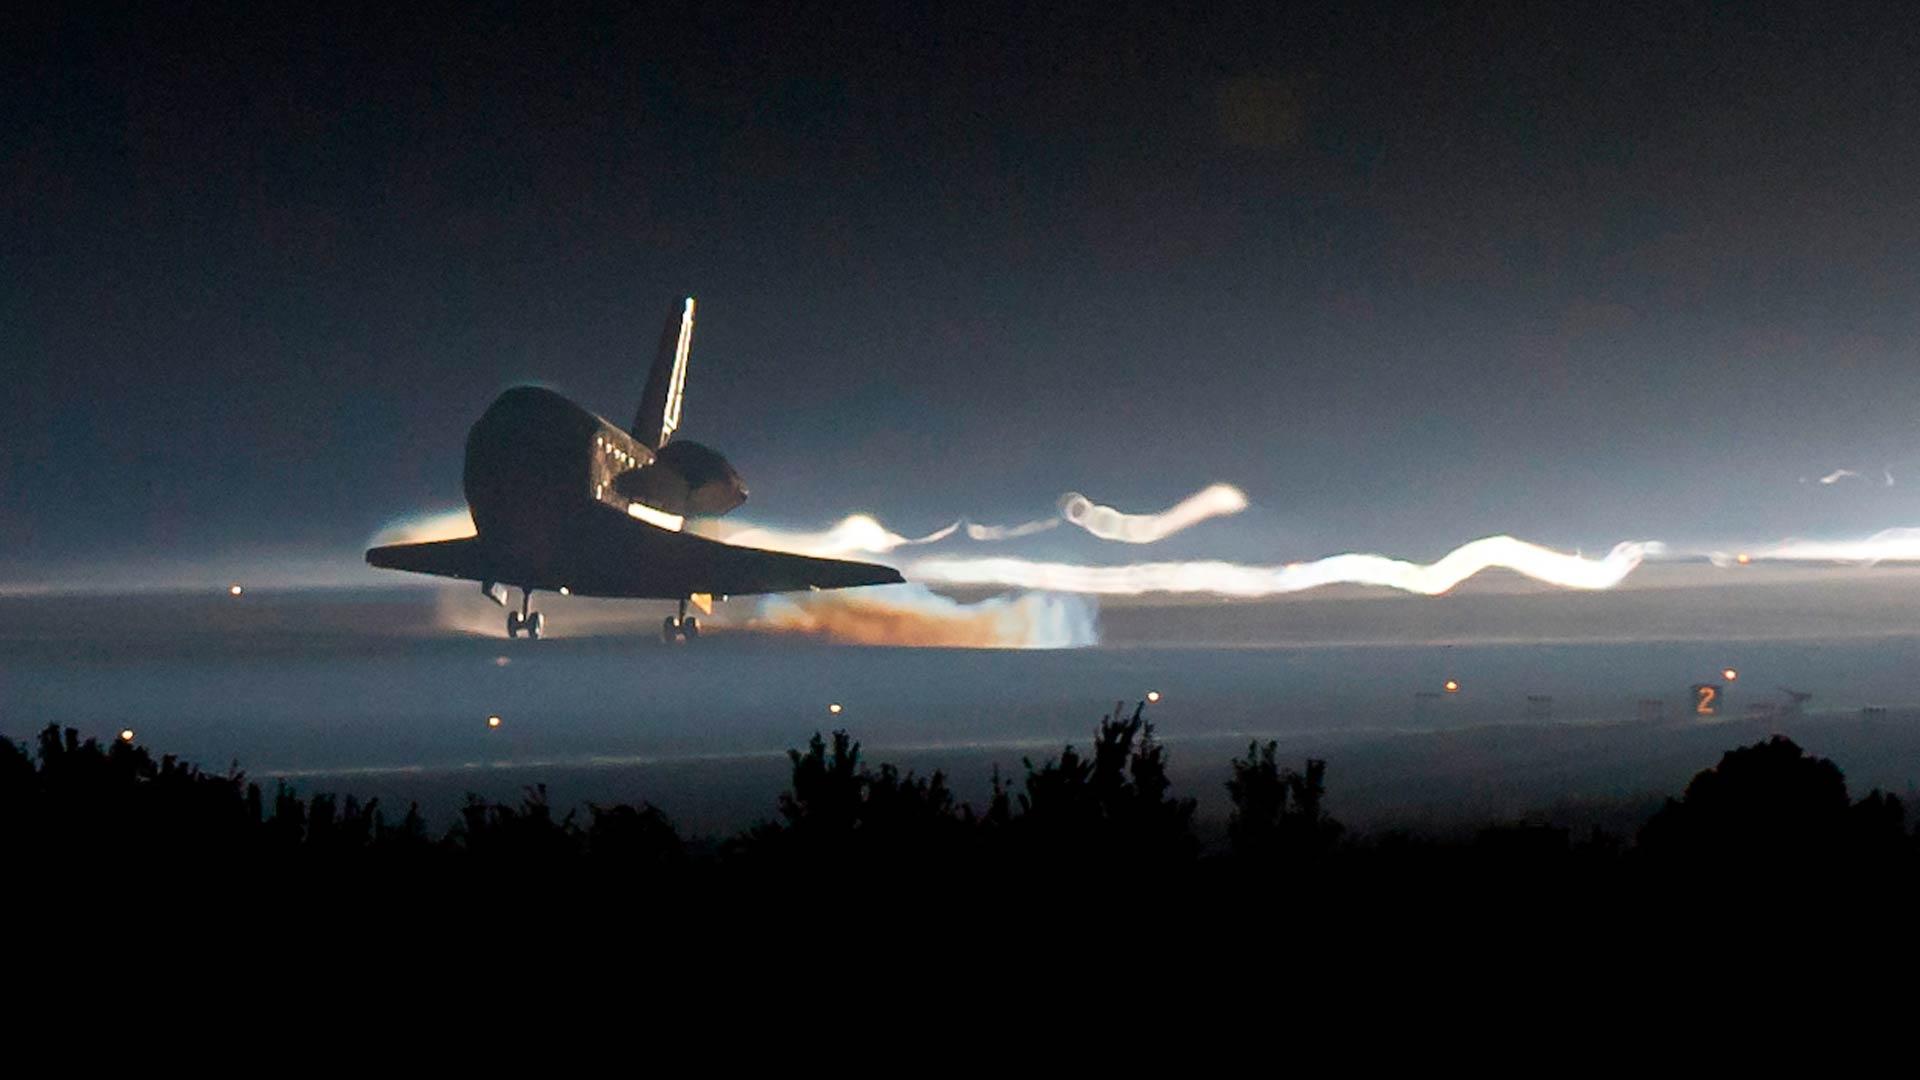 Free Download Space Shuttle Wallpaper Desktop Pics About